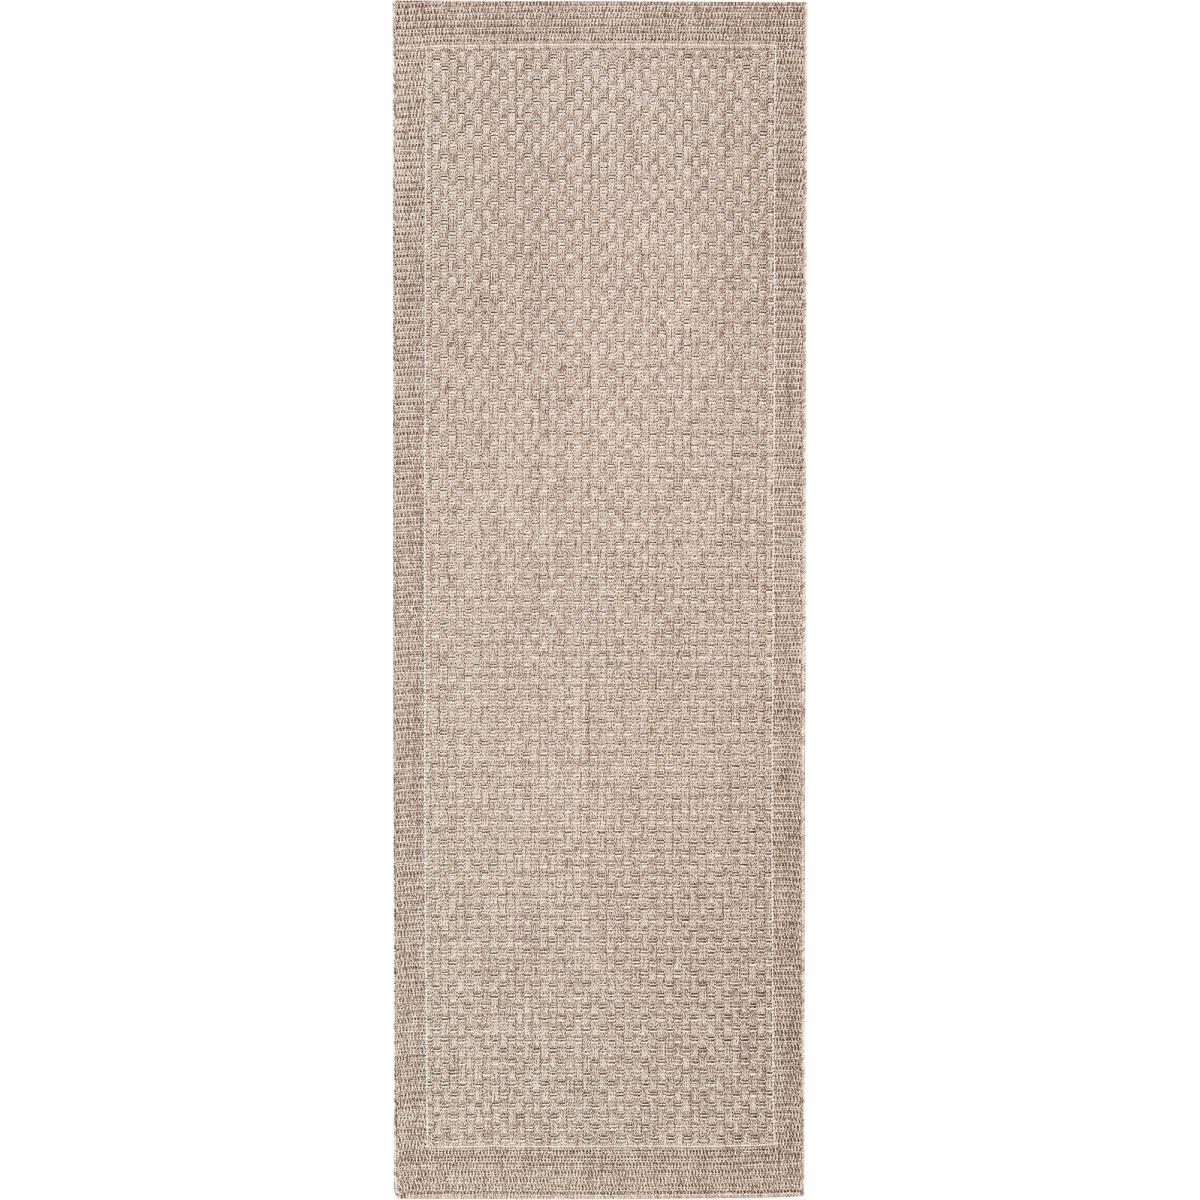 Ковёр Grace 39016/88 0.8х1.5 м цвет тёмно-серый